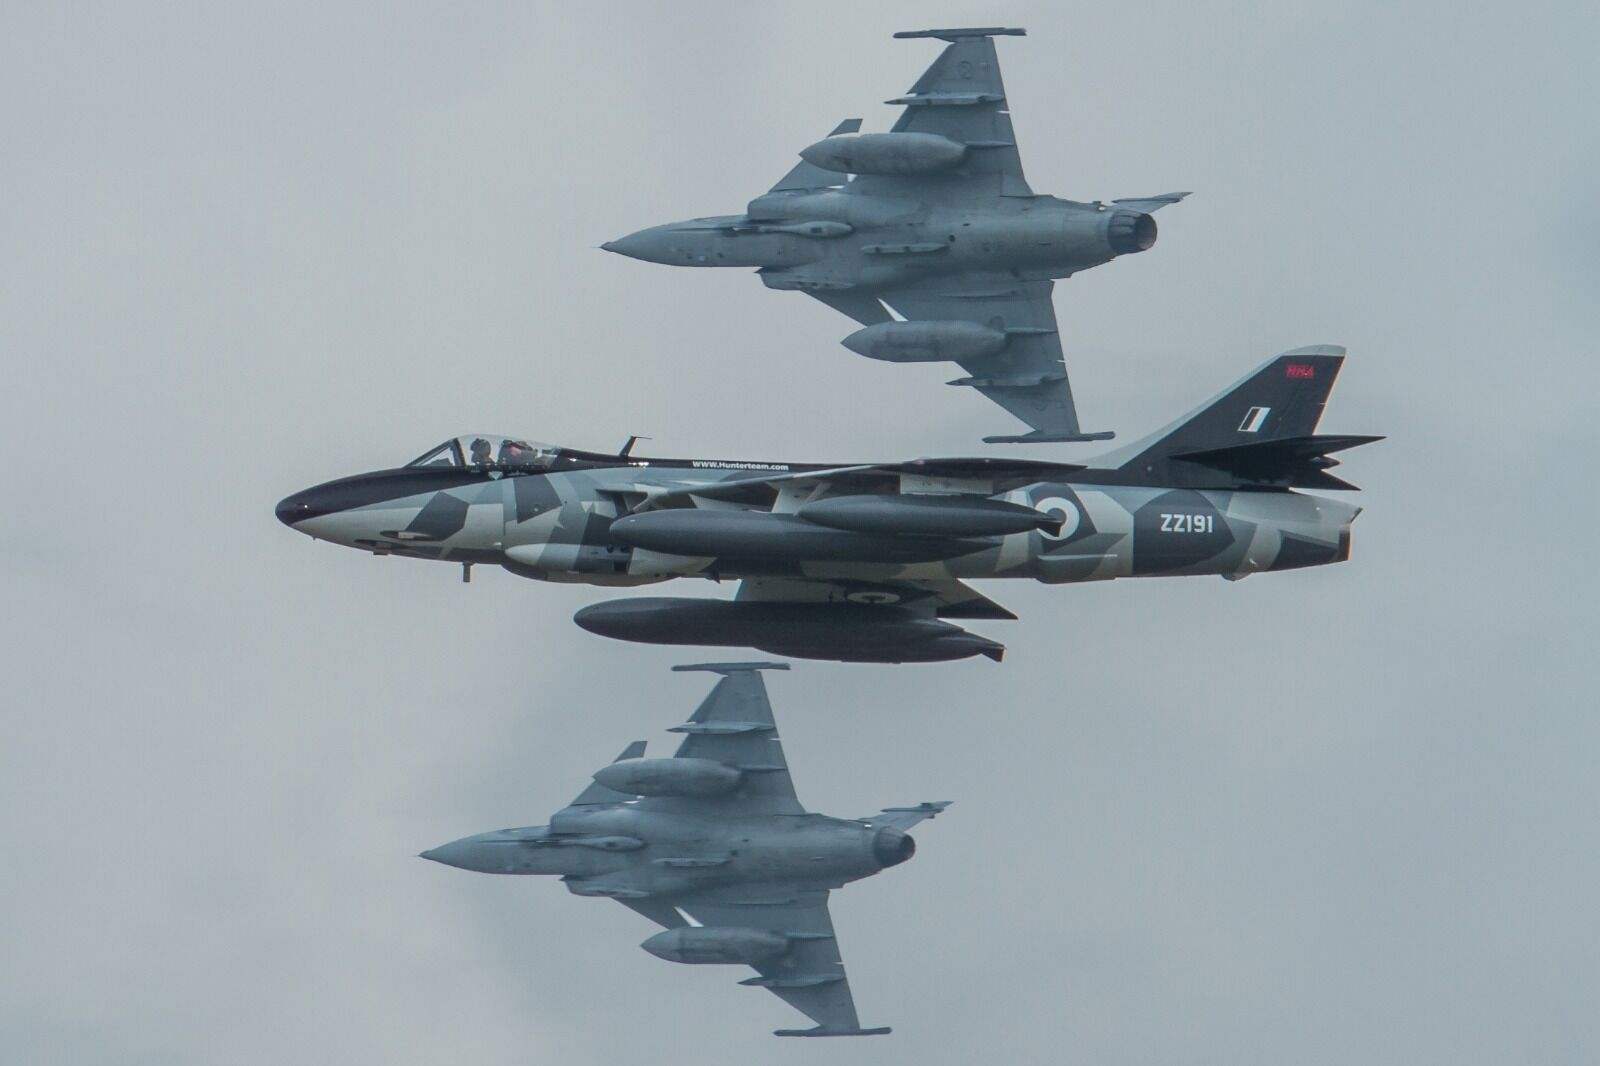 Hunter Team's Hunter flies by as 2 Saab Grippen's break to land.